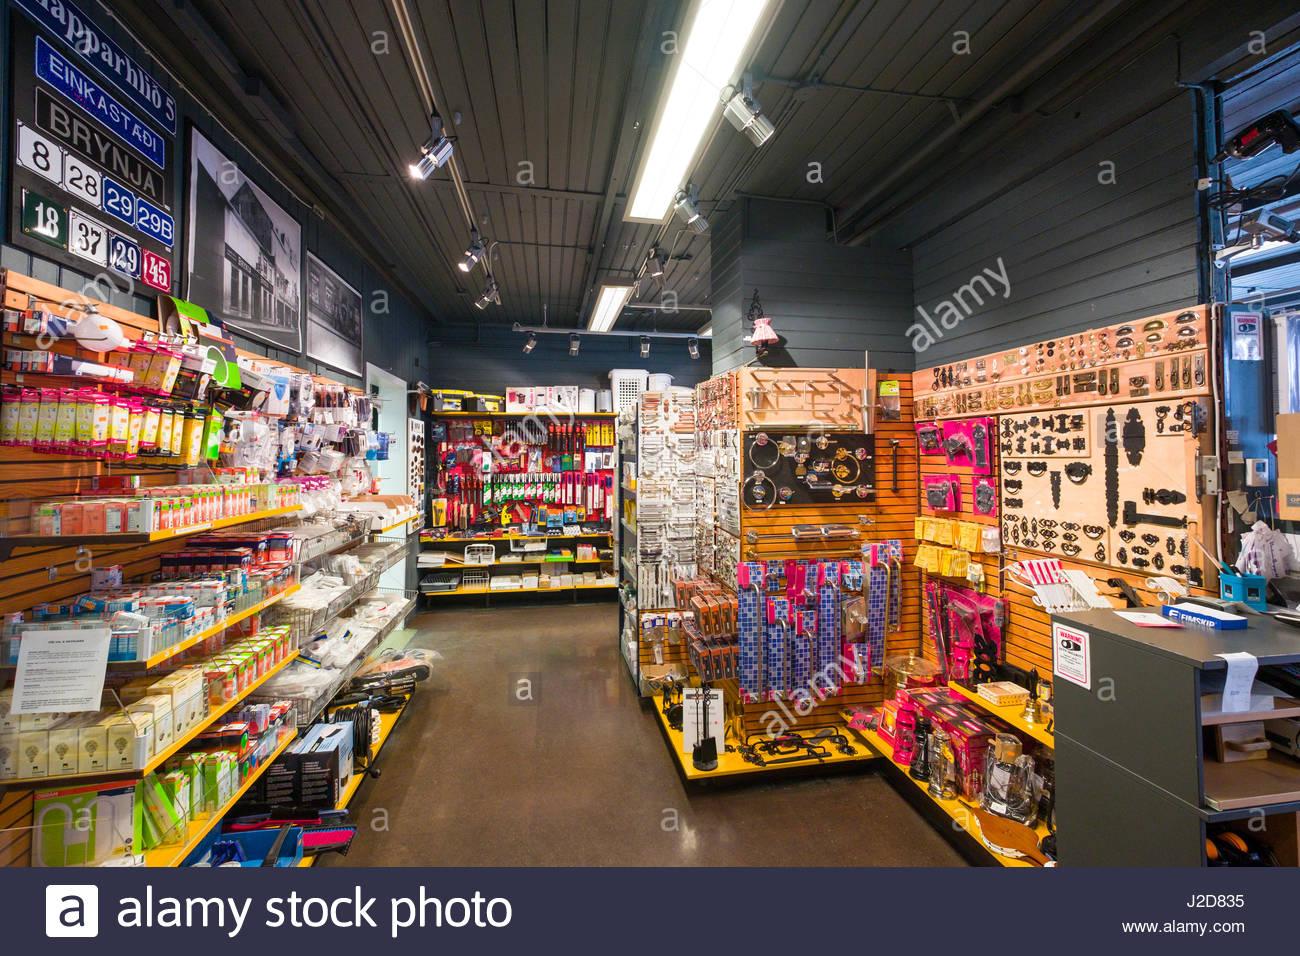 Variety Store Shelves Stock Photos & Variety Store Shelves ...